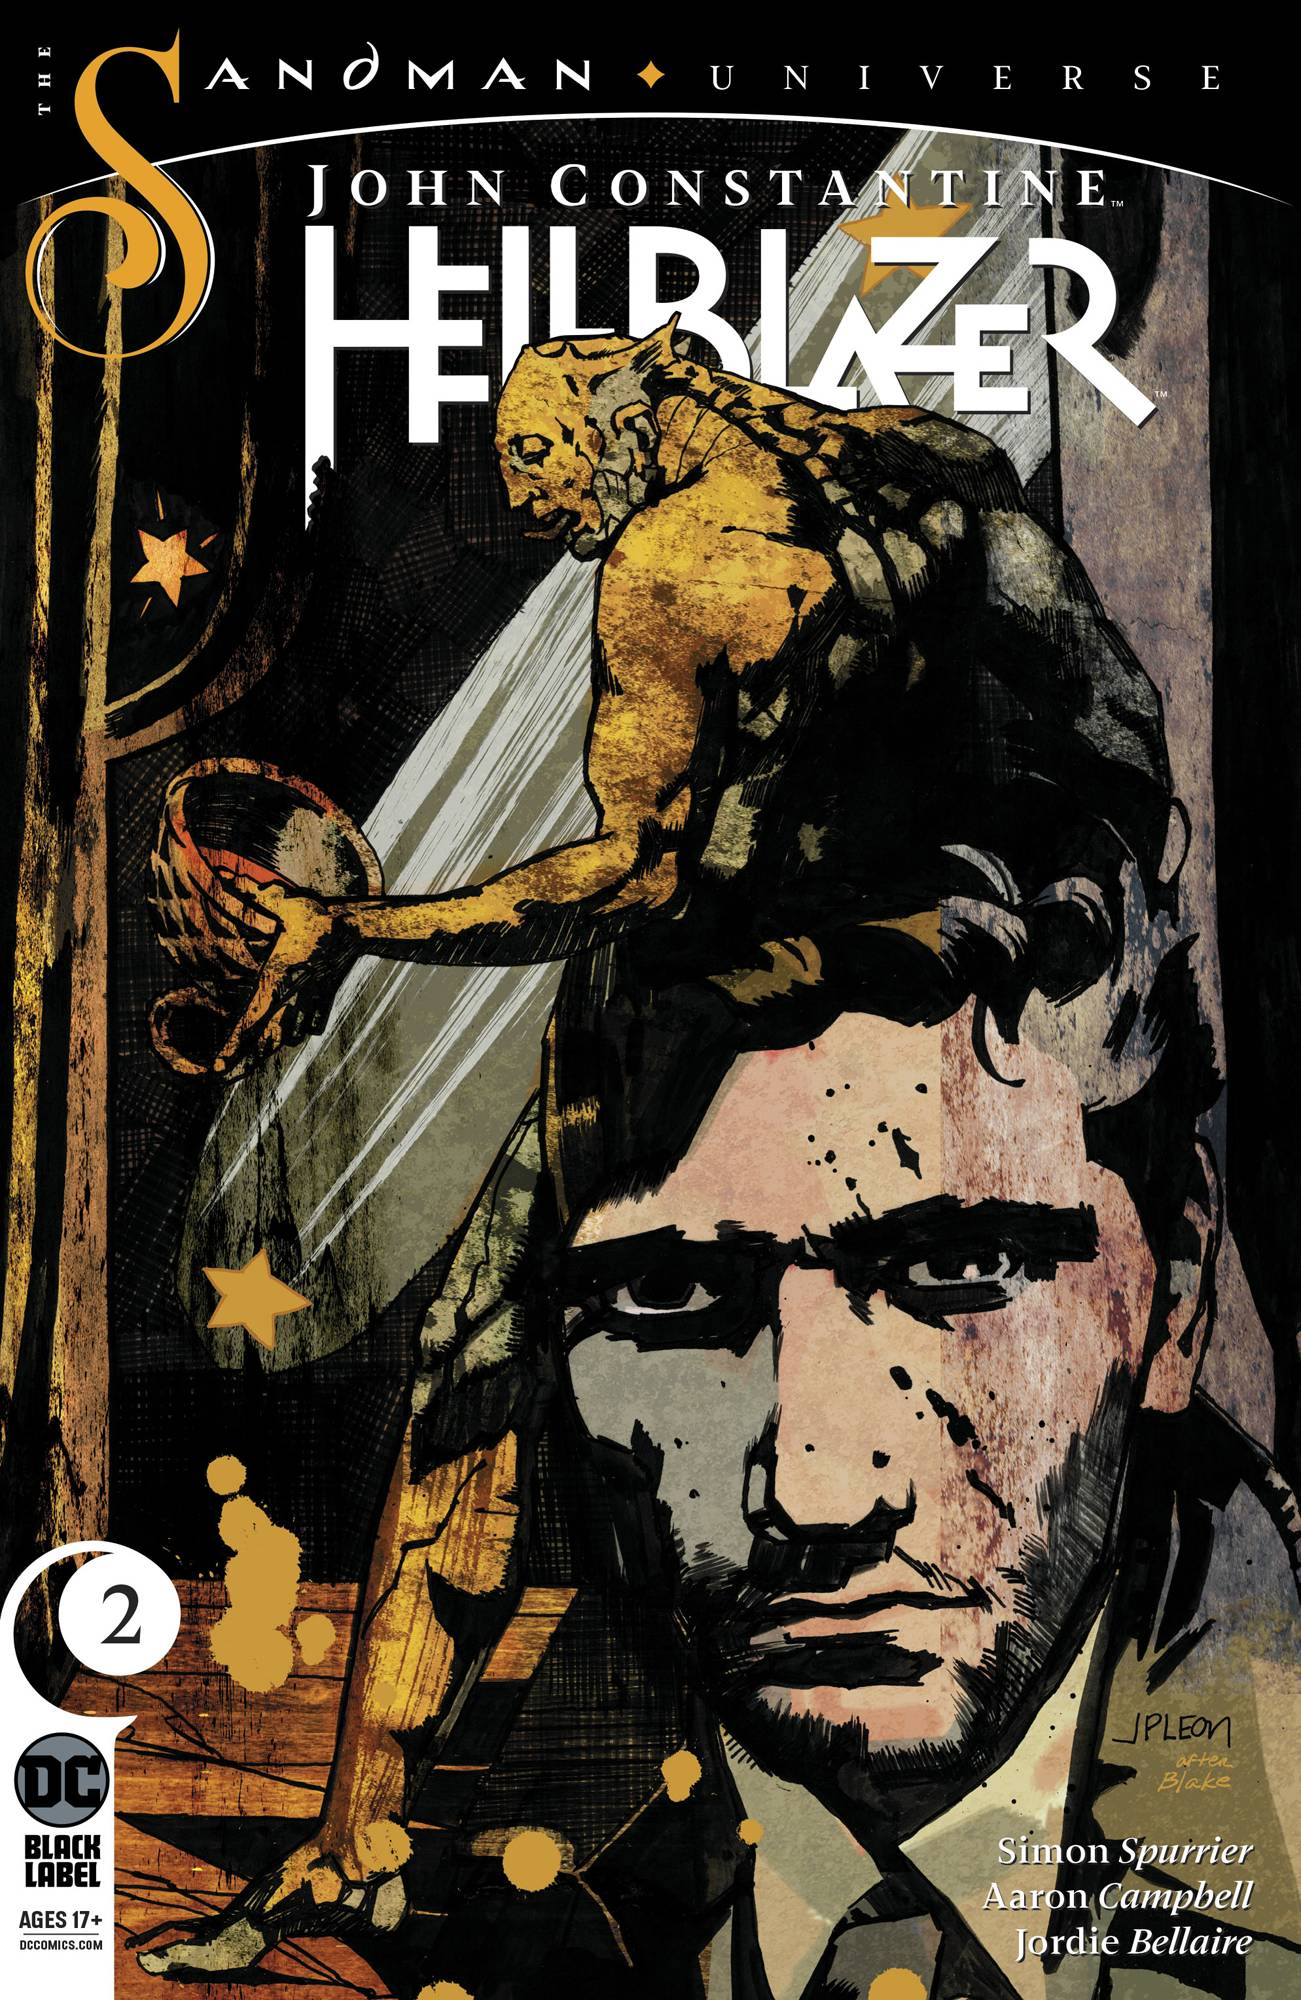 John Constantine Hellblazer #2 (2019)